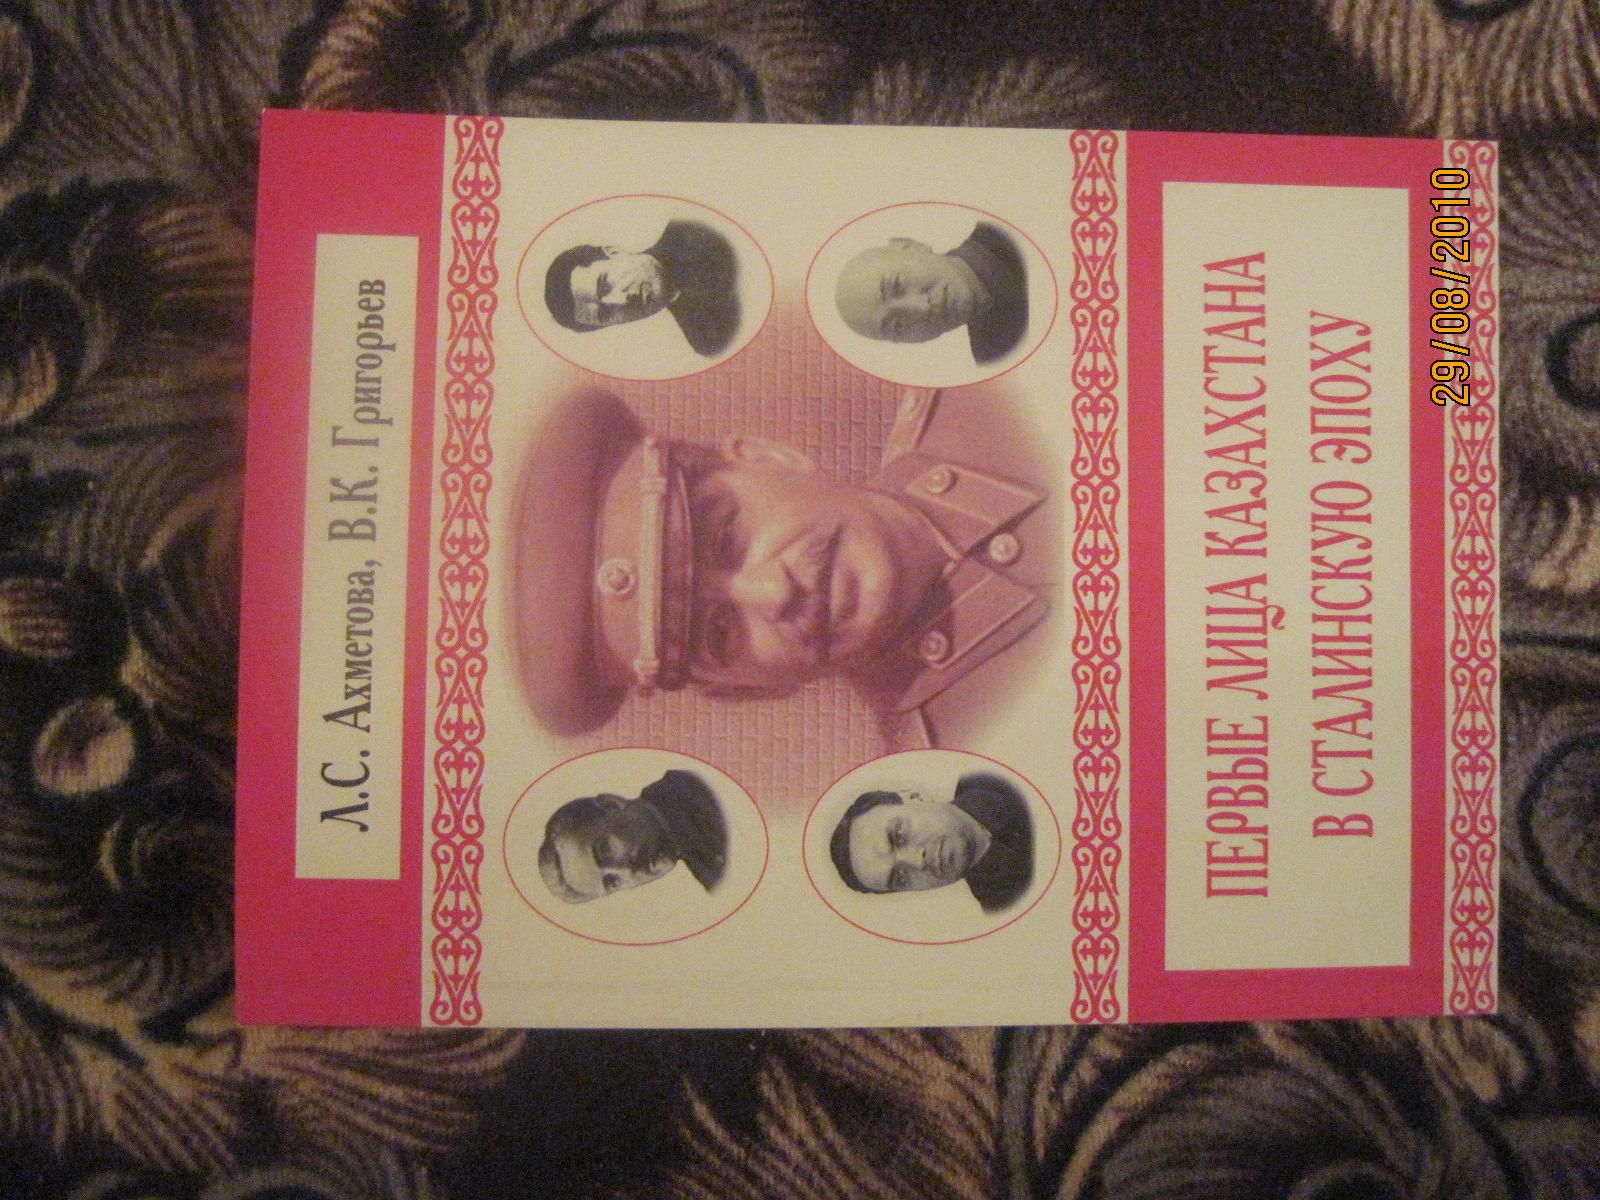 Akhmetova_Laila_2010_08_27_Stalin_KZ_leaders_00_book_folder_Akhmetova_Grigoryev